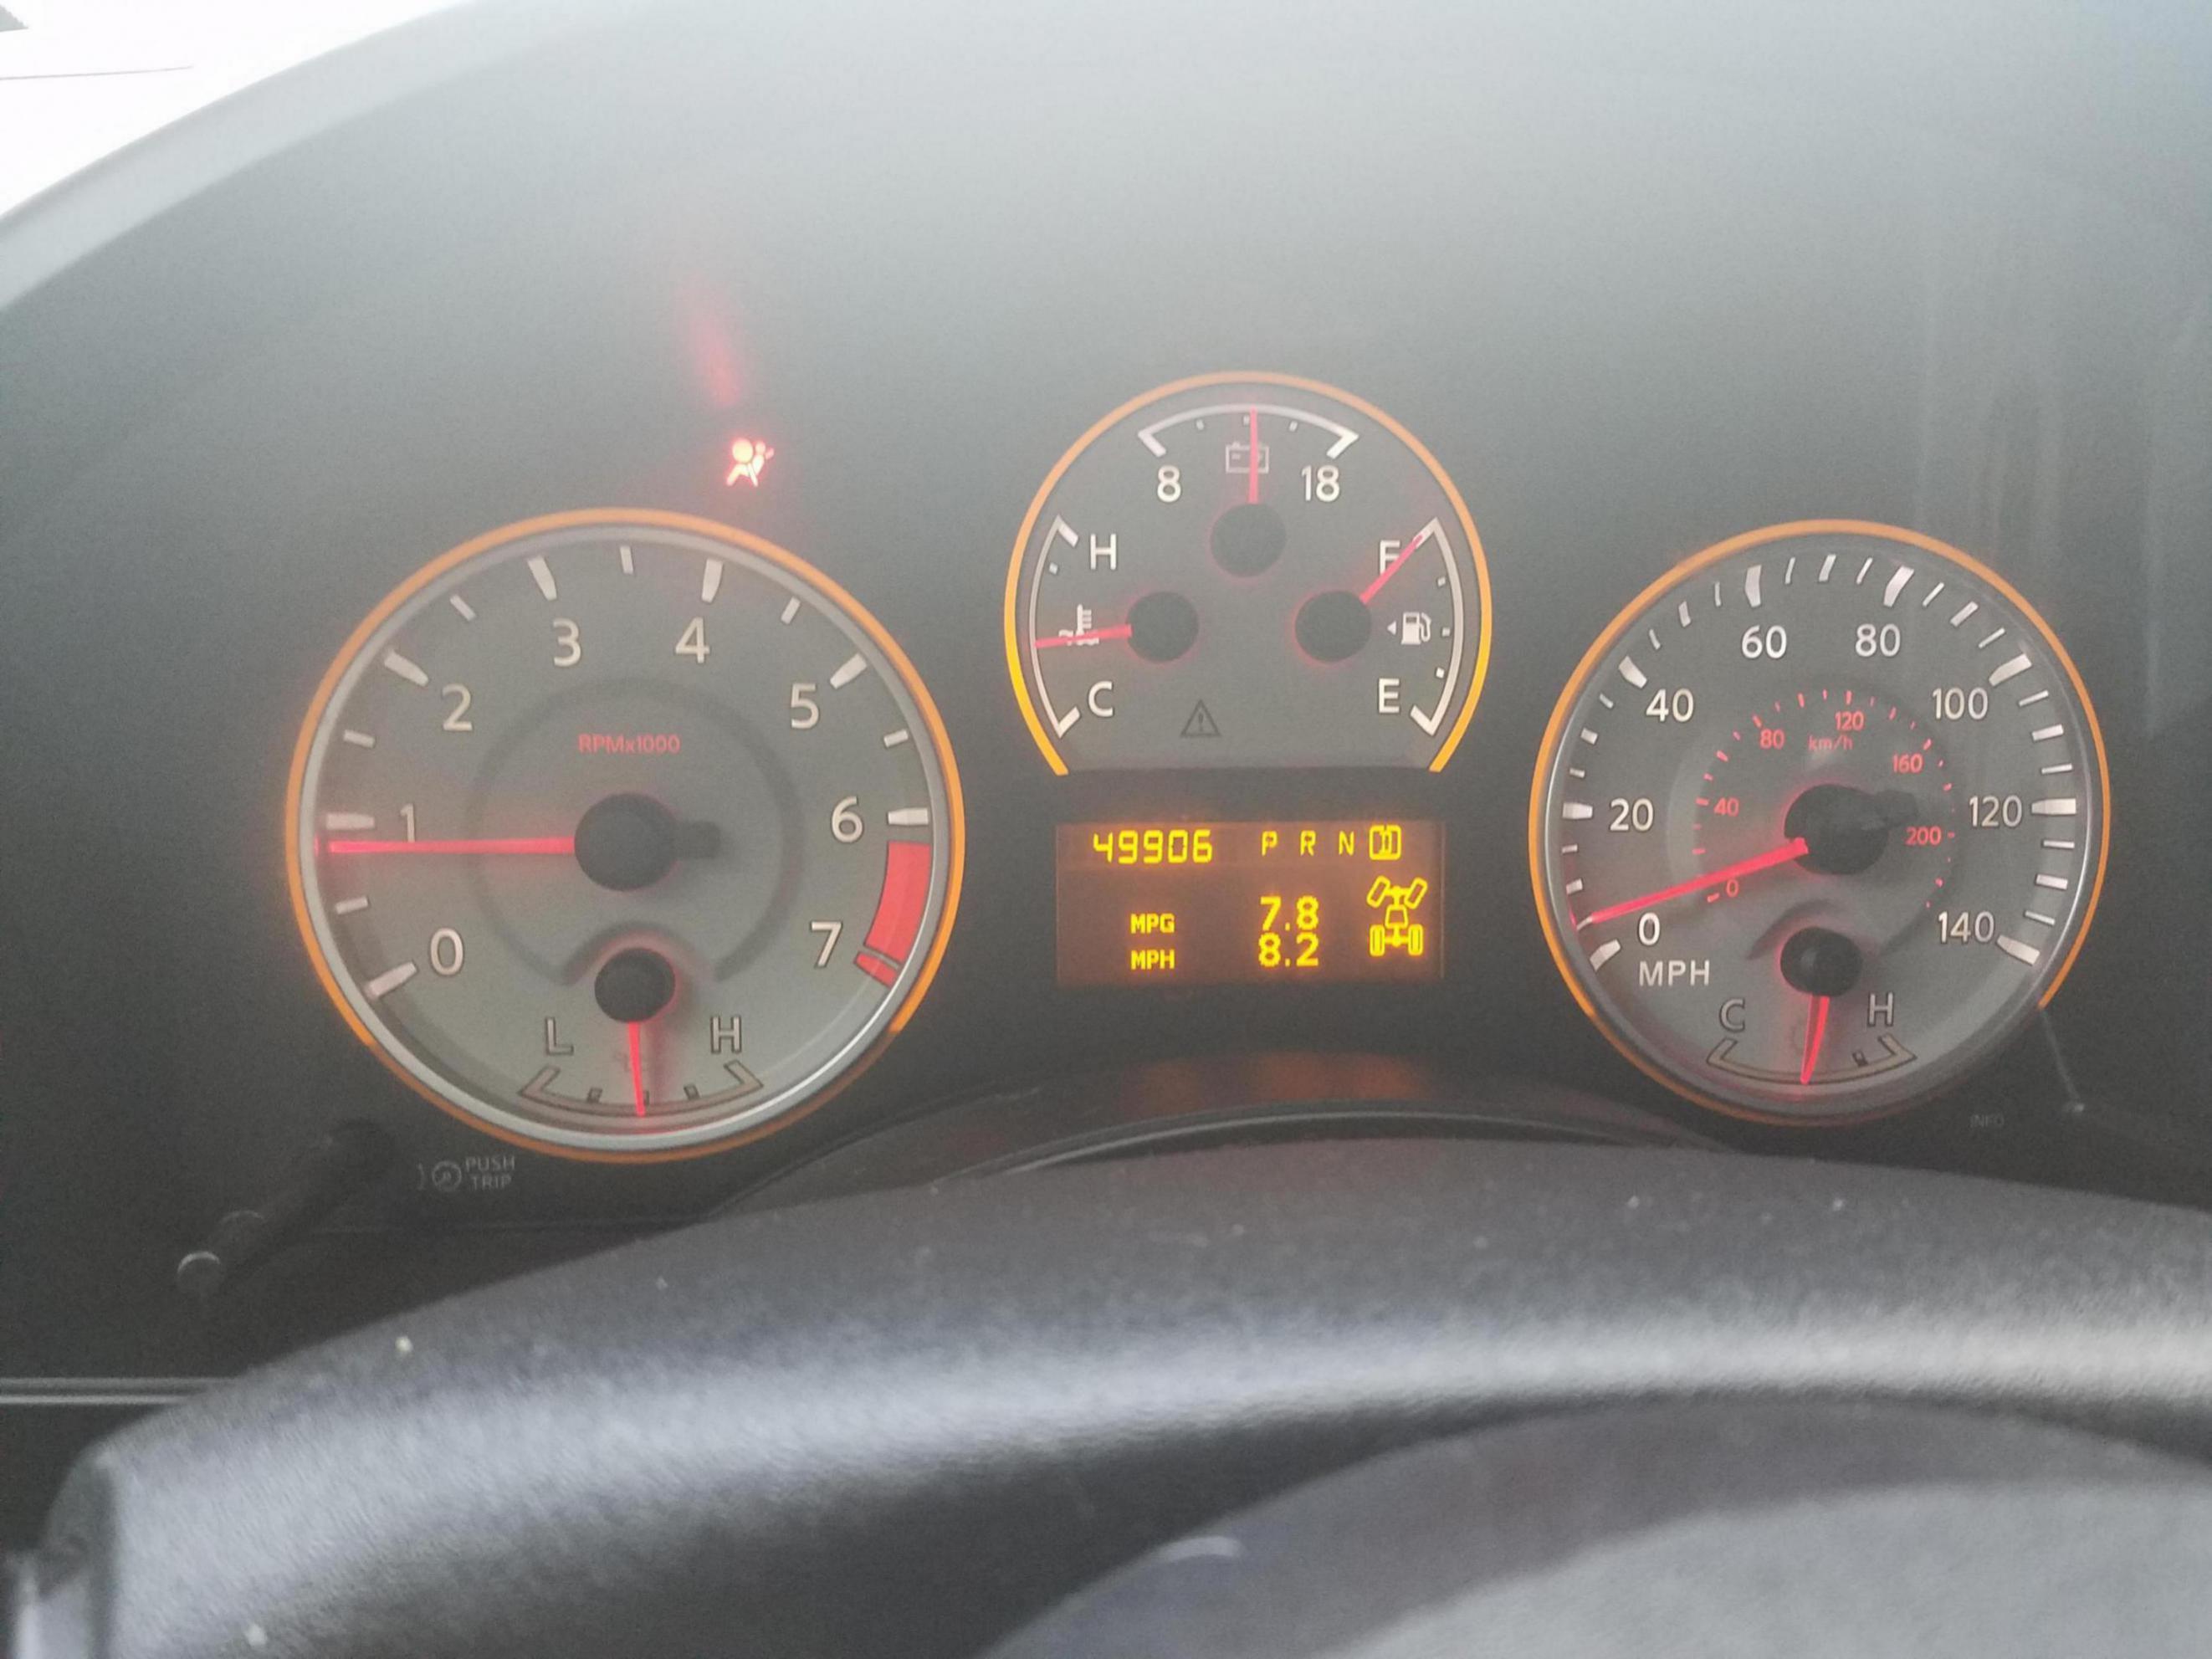 Terrible gas mileage 8mpg 20161014_180803_1476483110902 jpg